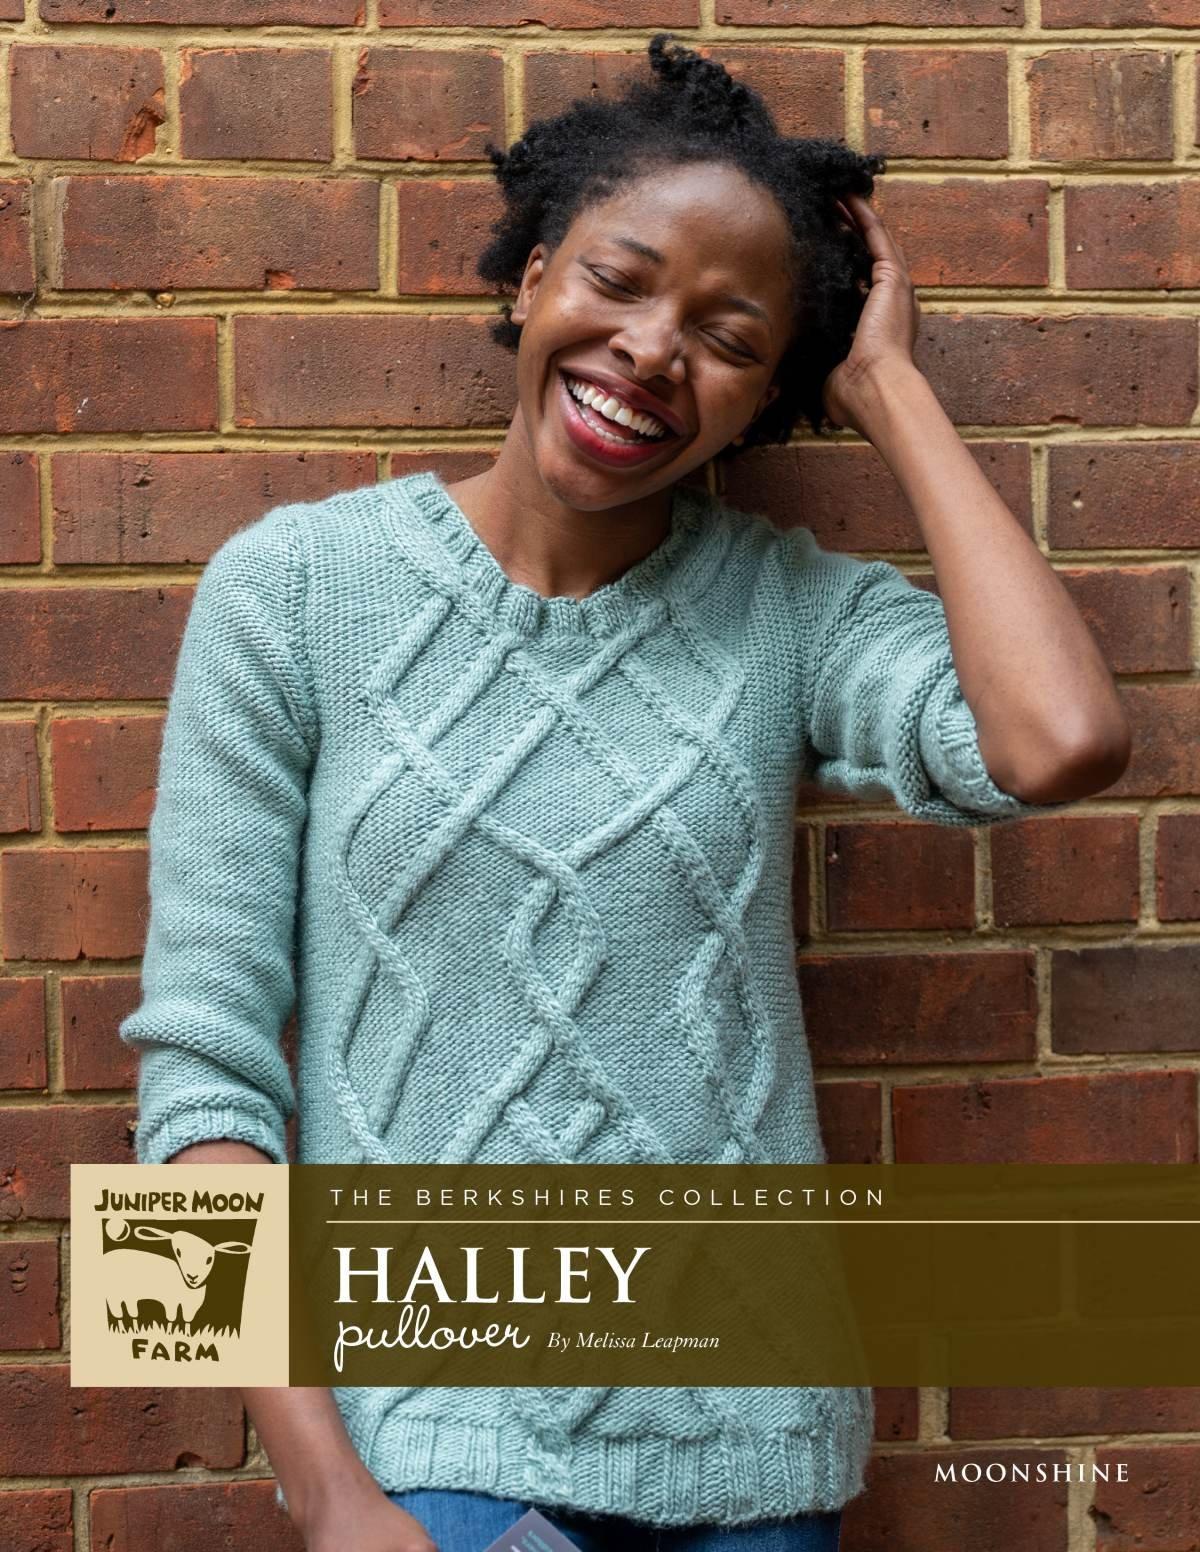 Halley Pullover pattern